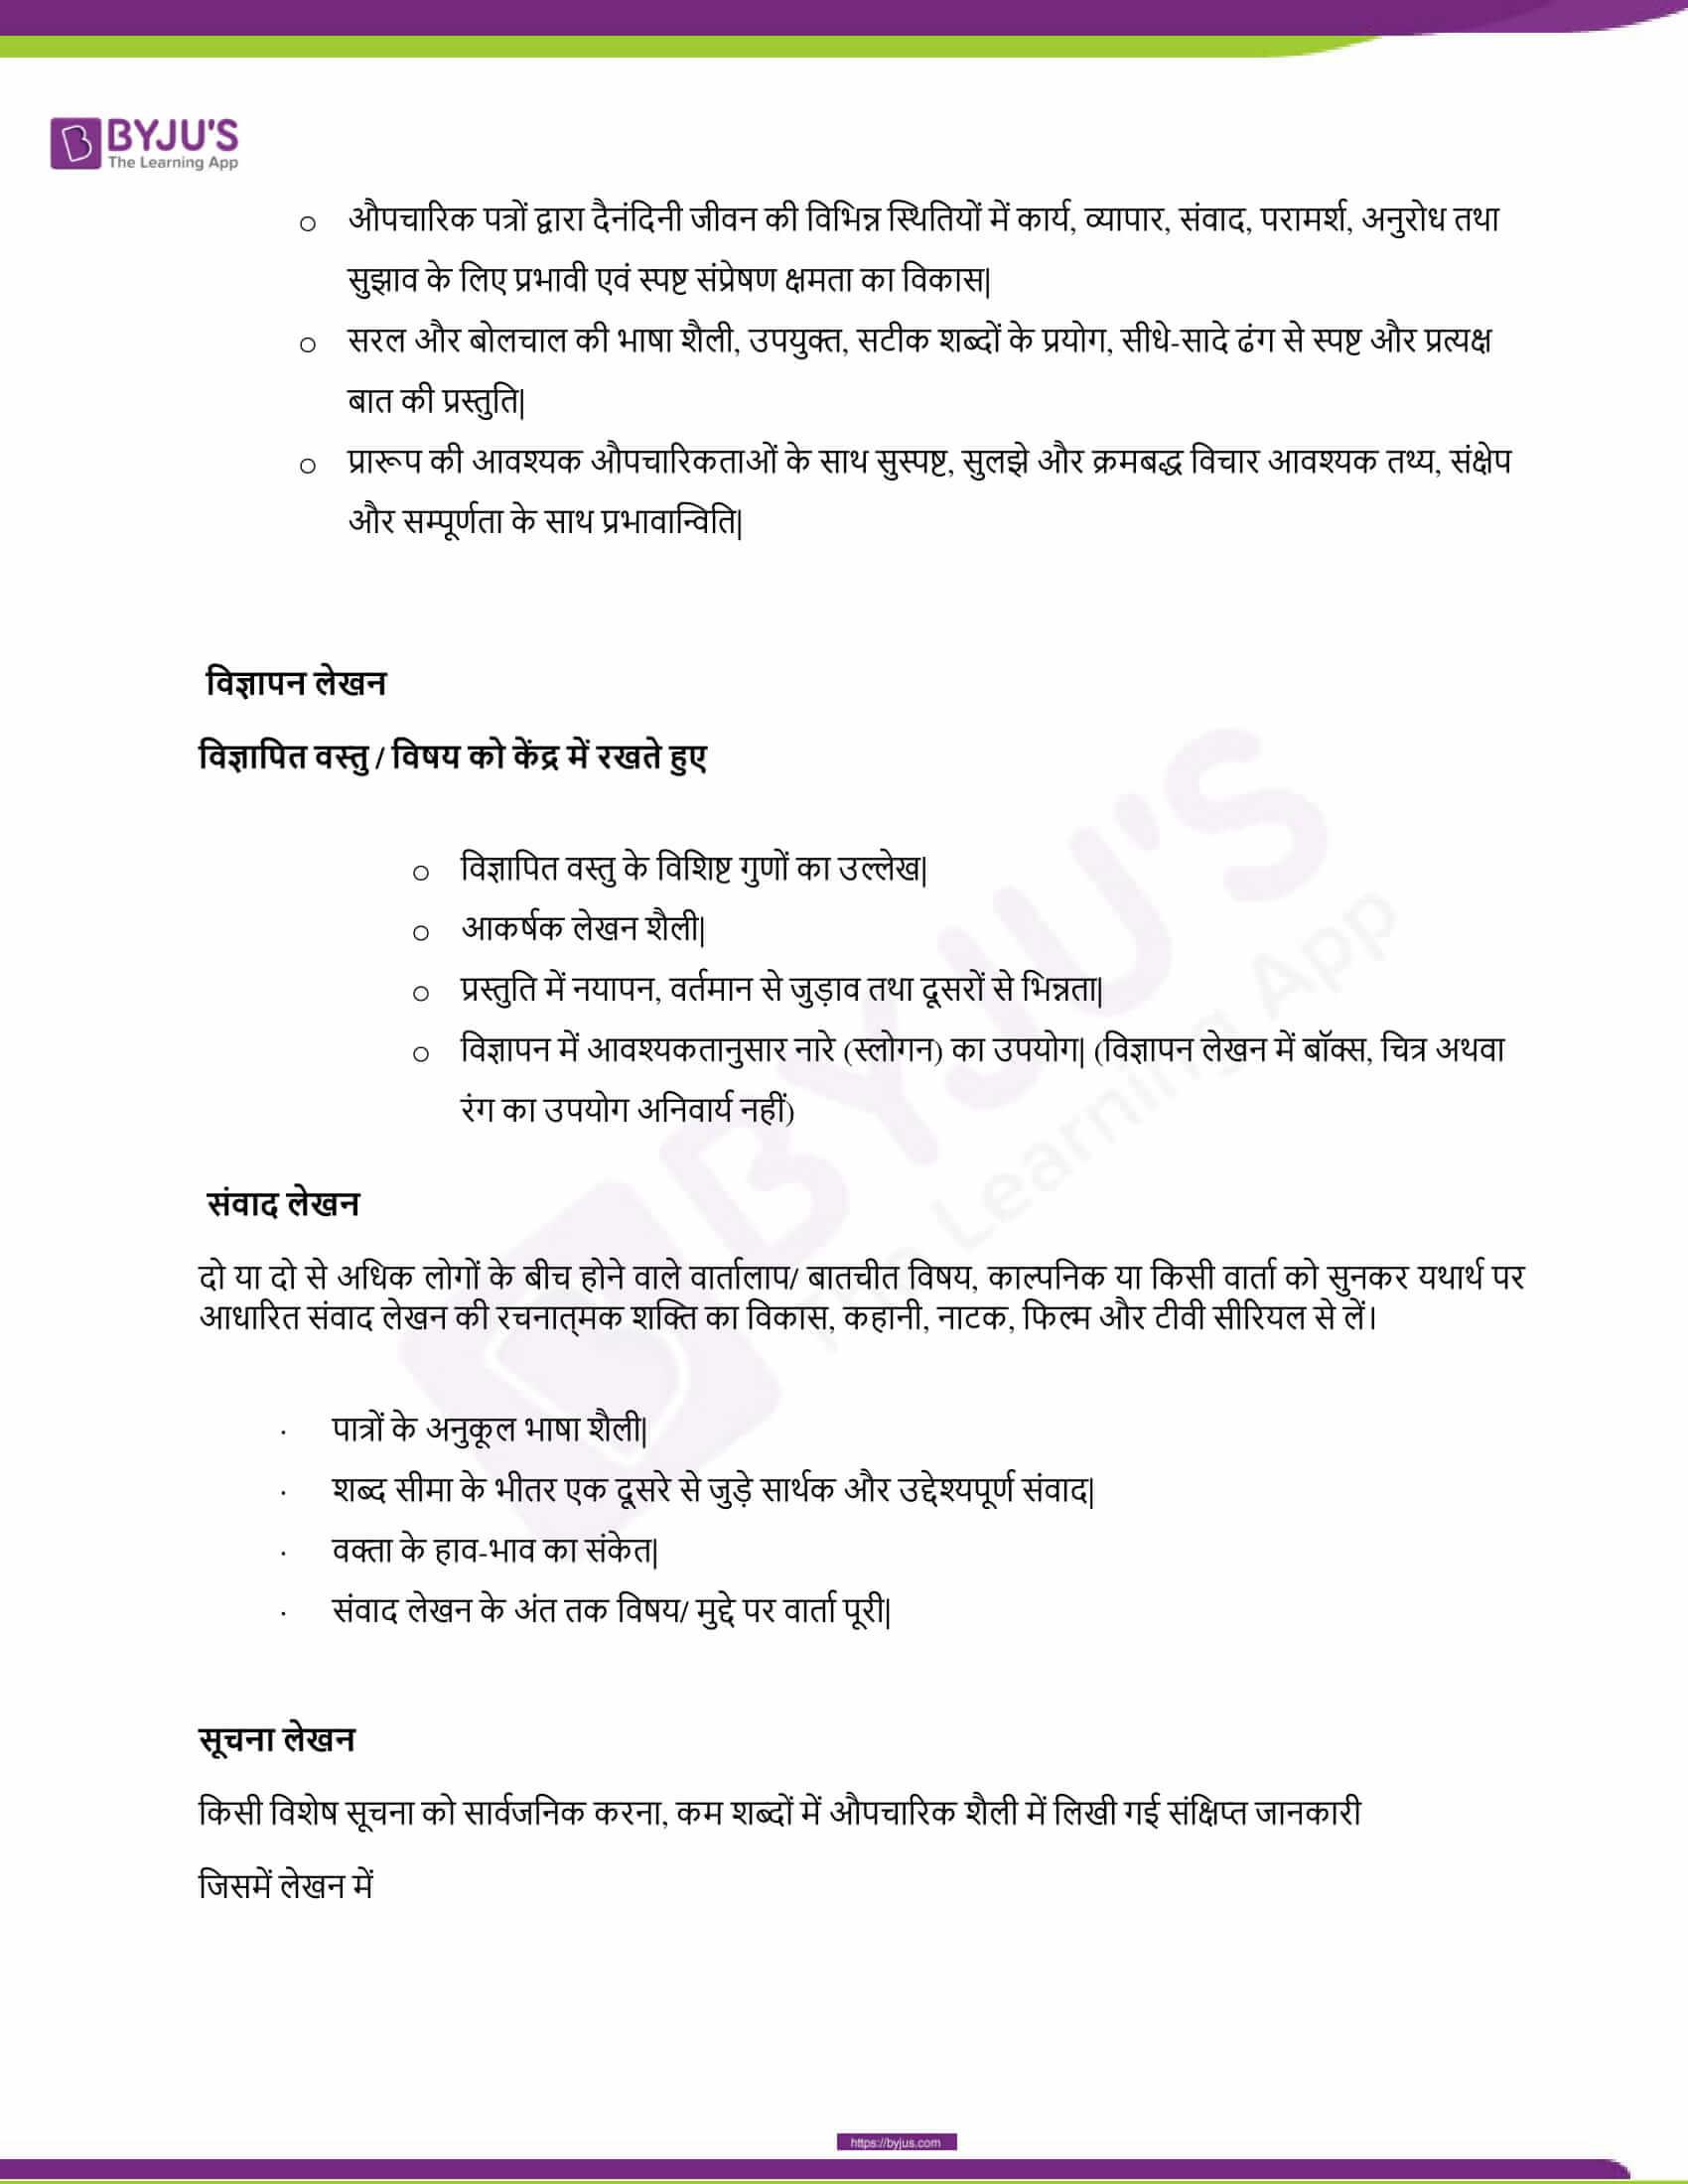 CBSE Class 10 Hindi Course B Revised Syllabus 2020 21 06